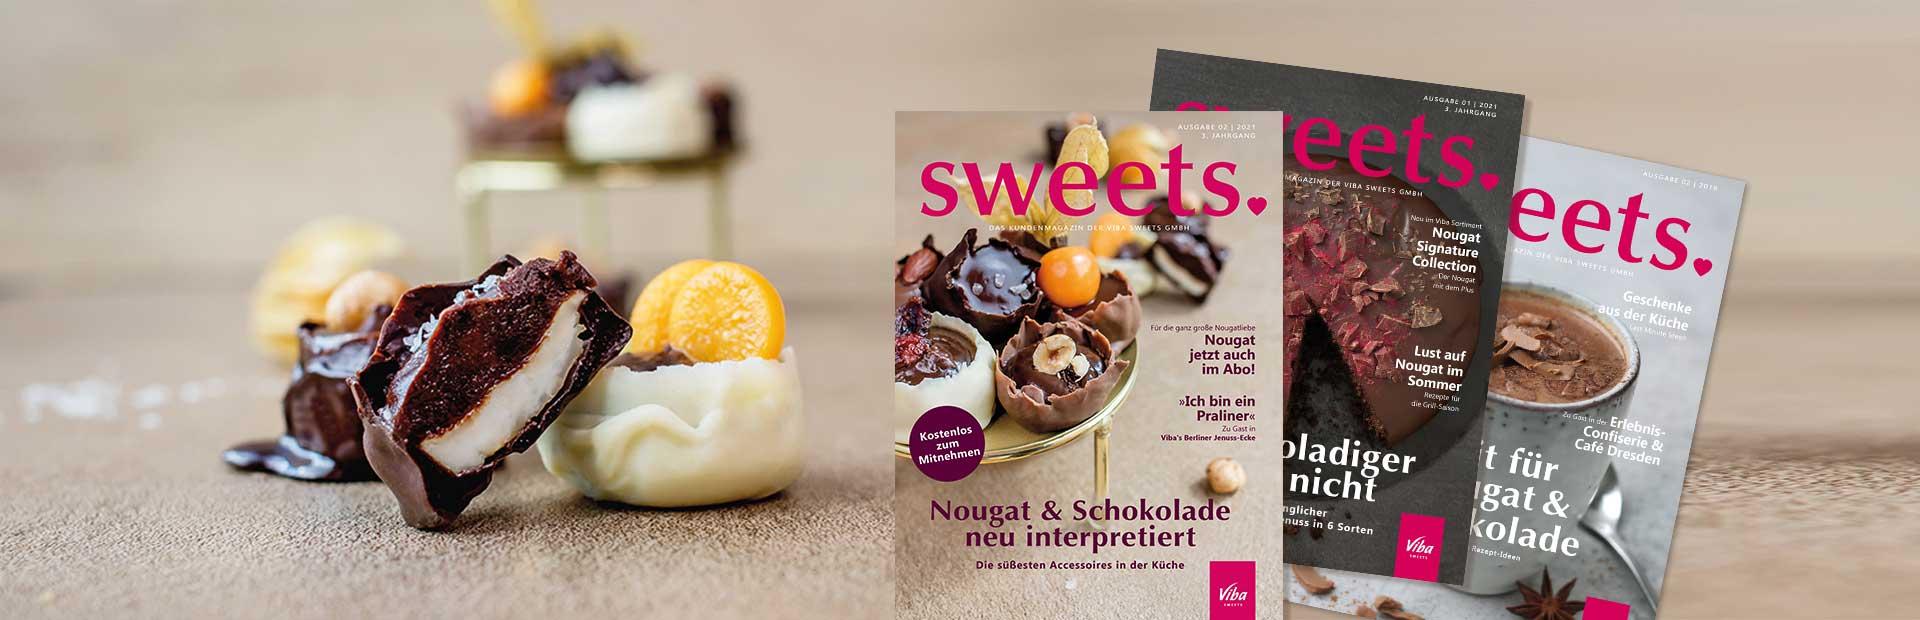 Kundenmagazine sweets. im Überblick